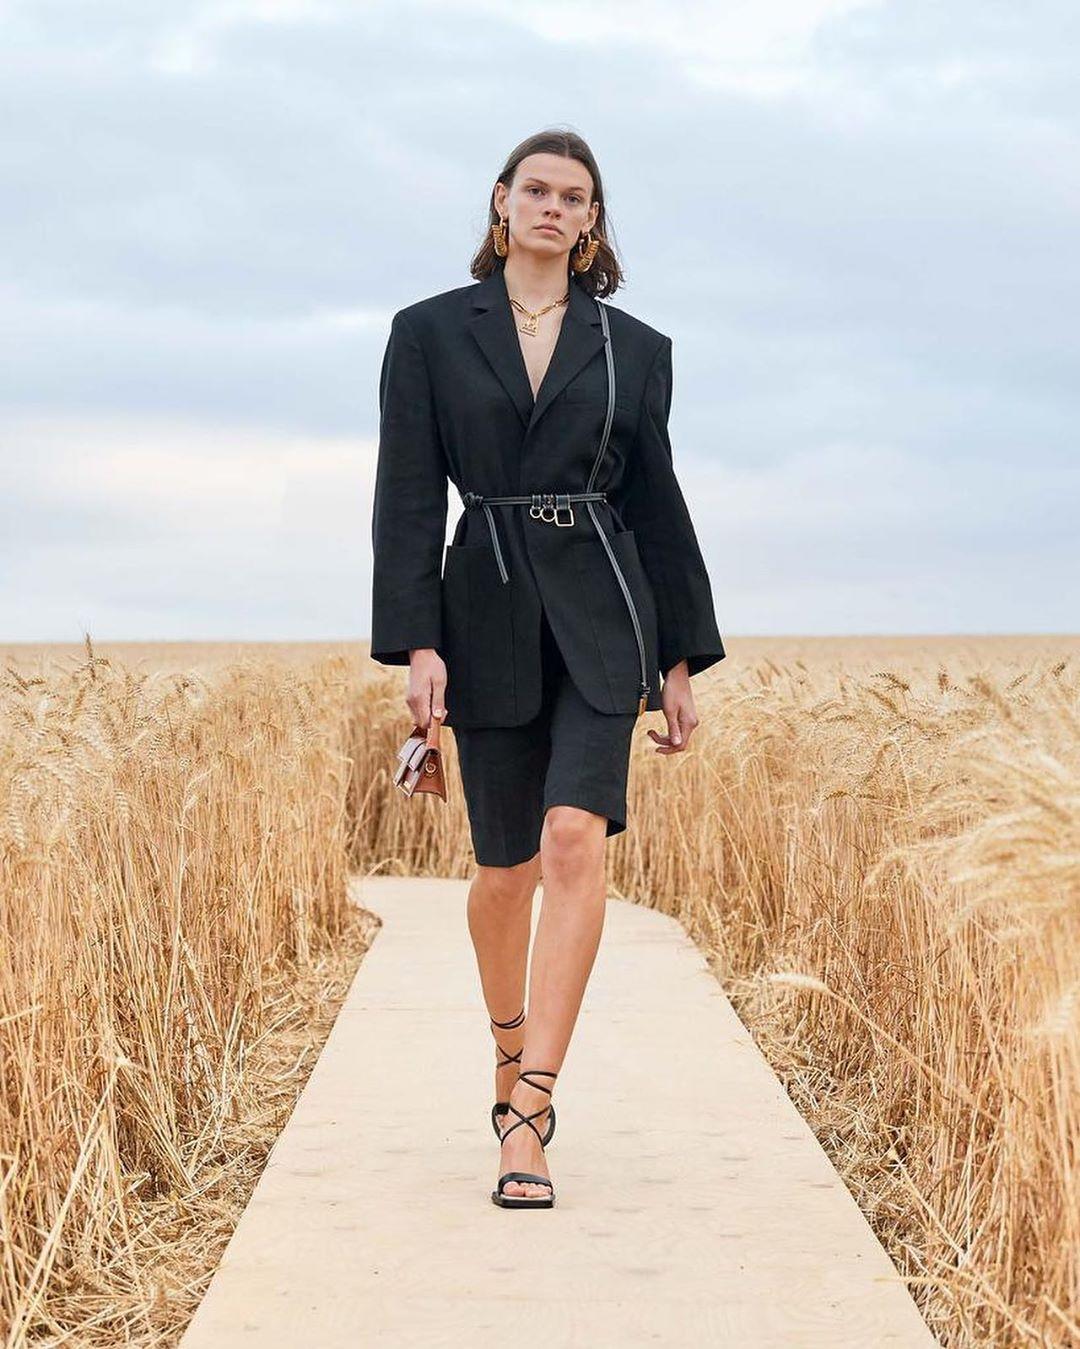 Jacquemus womenswear SS'21